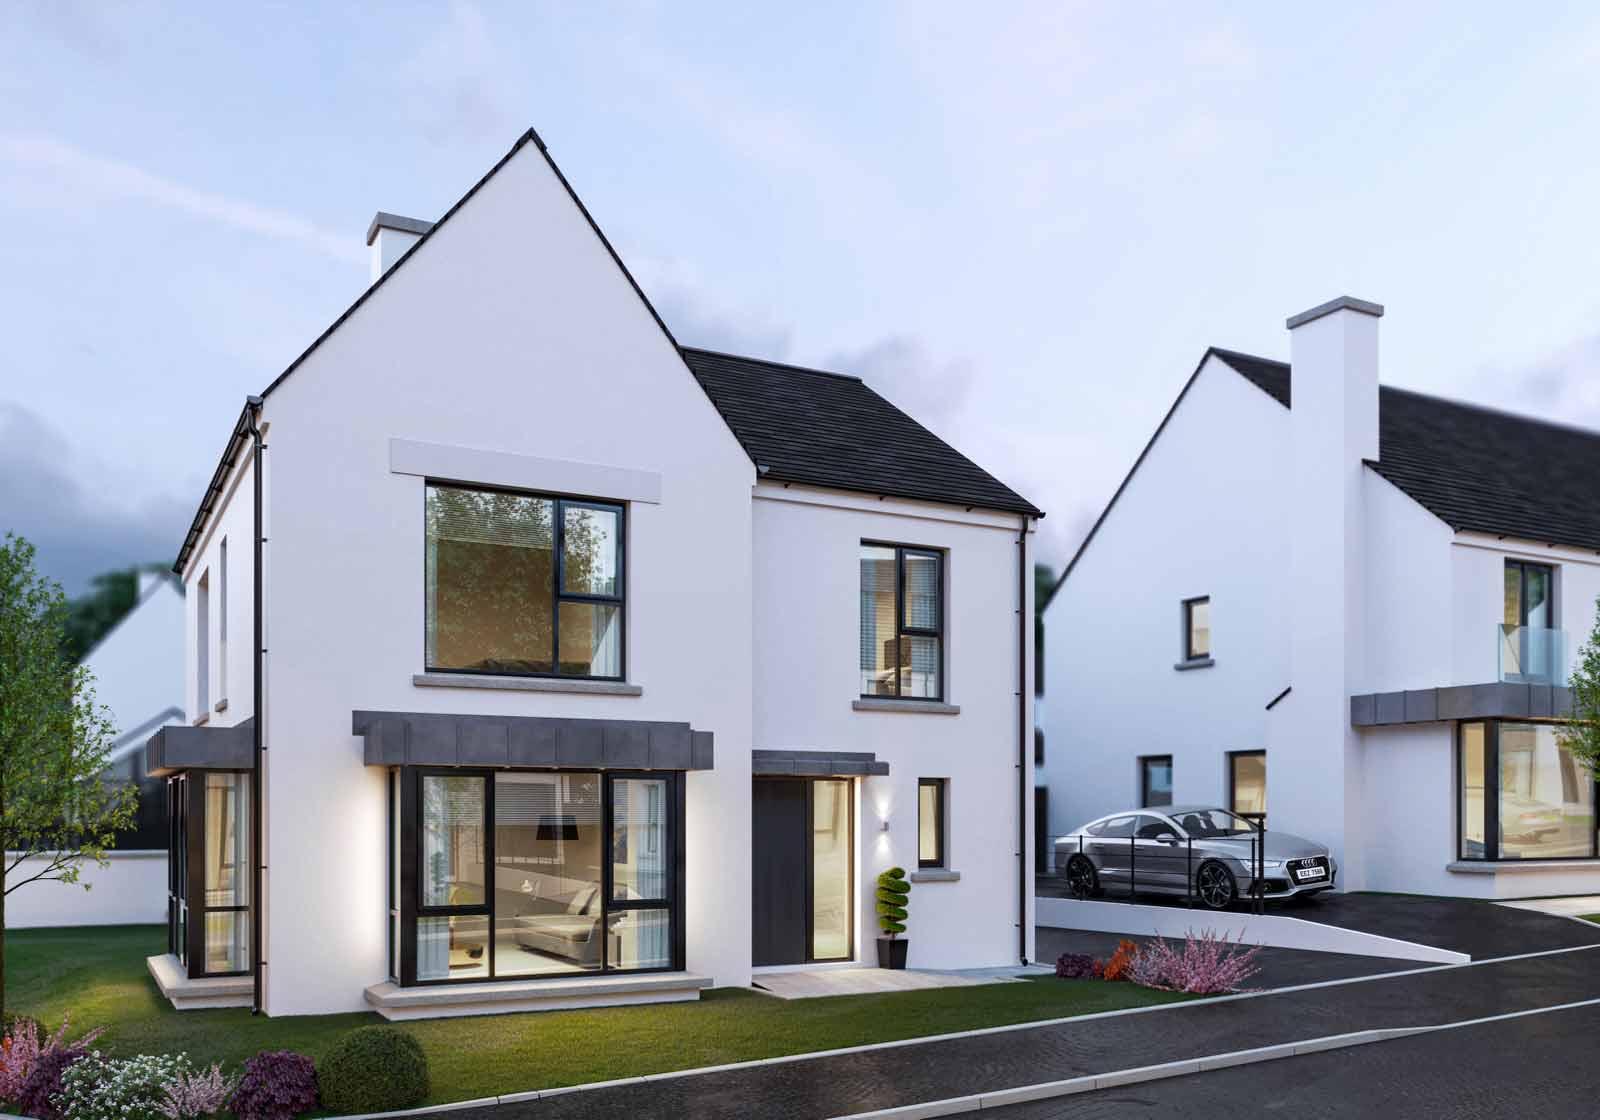 Portstewart Road, Coleraine